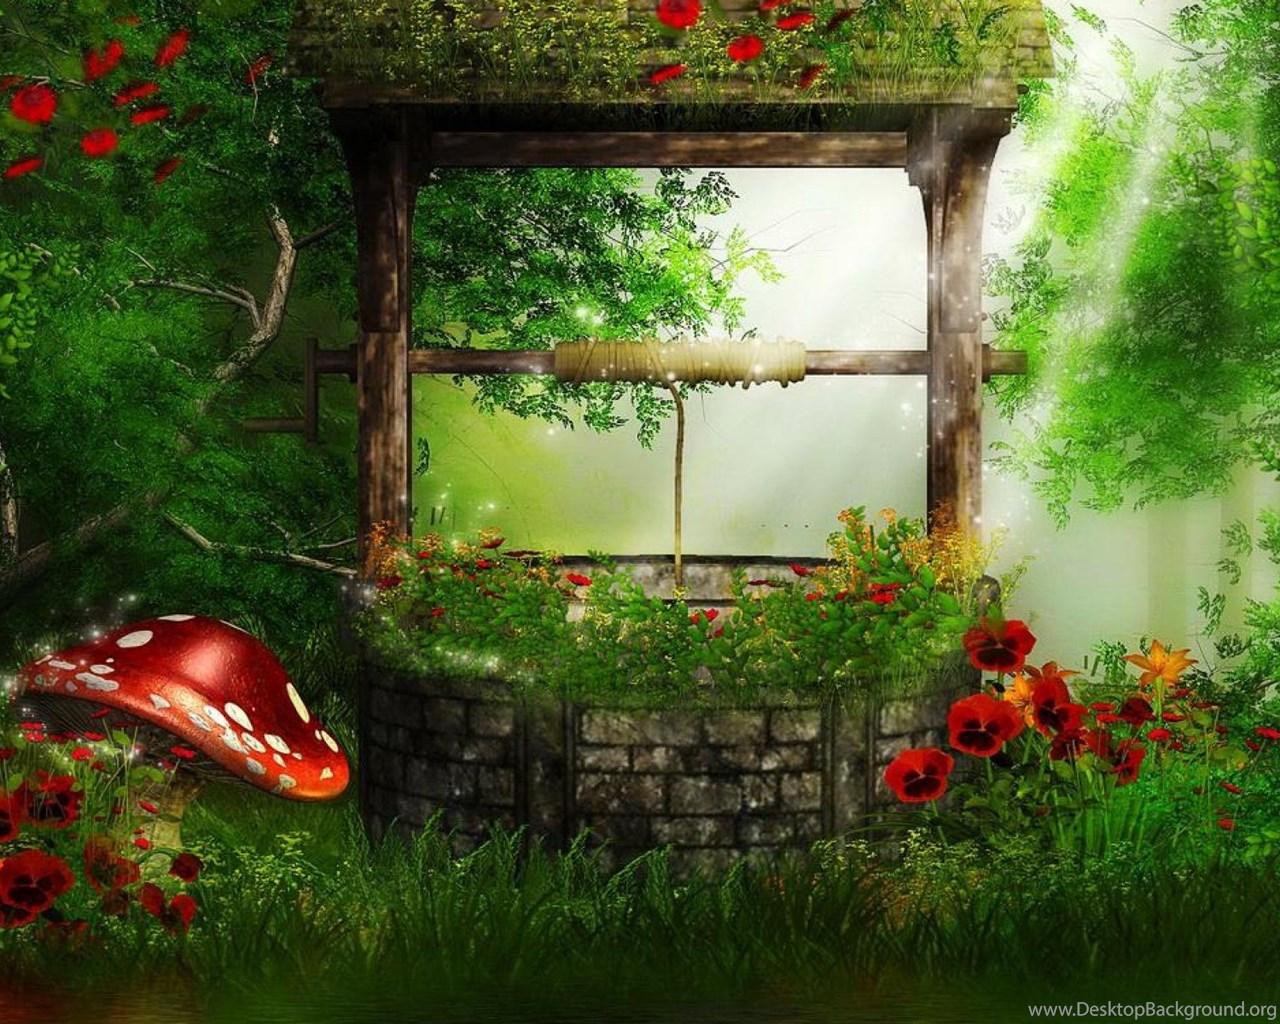 Digital Photo Studio Backgrounds Hd 10892 Pacify Mind Desktop Background